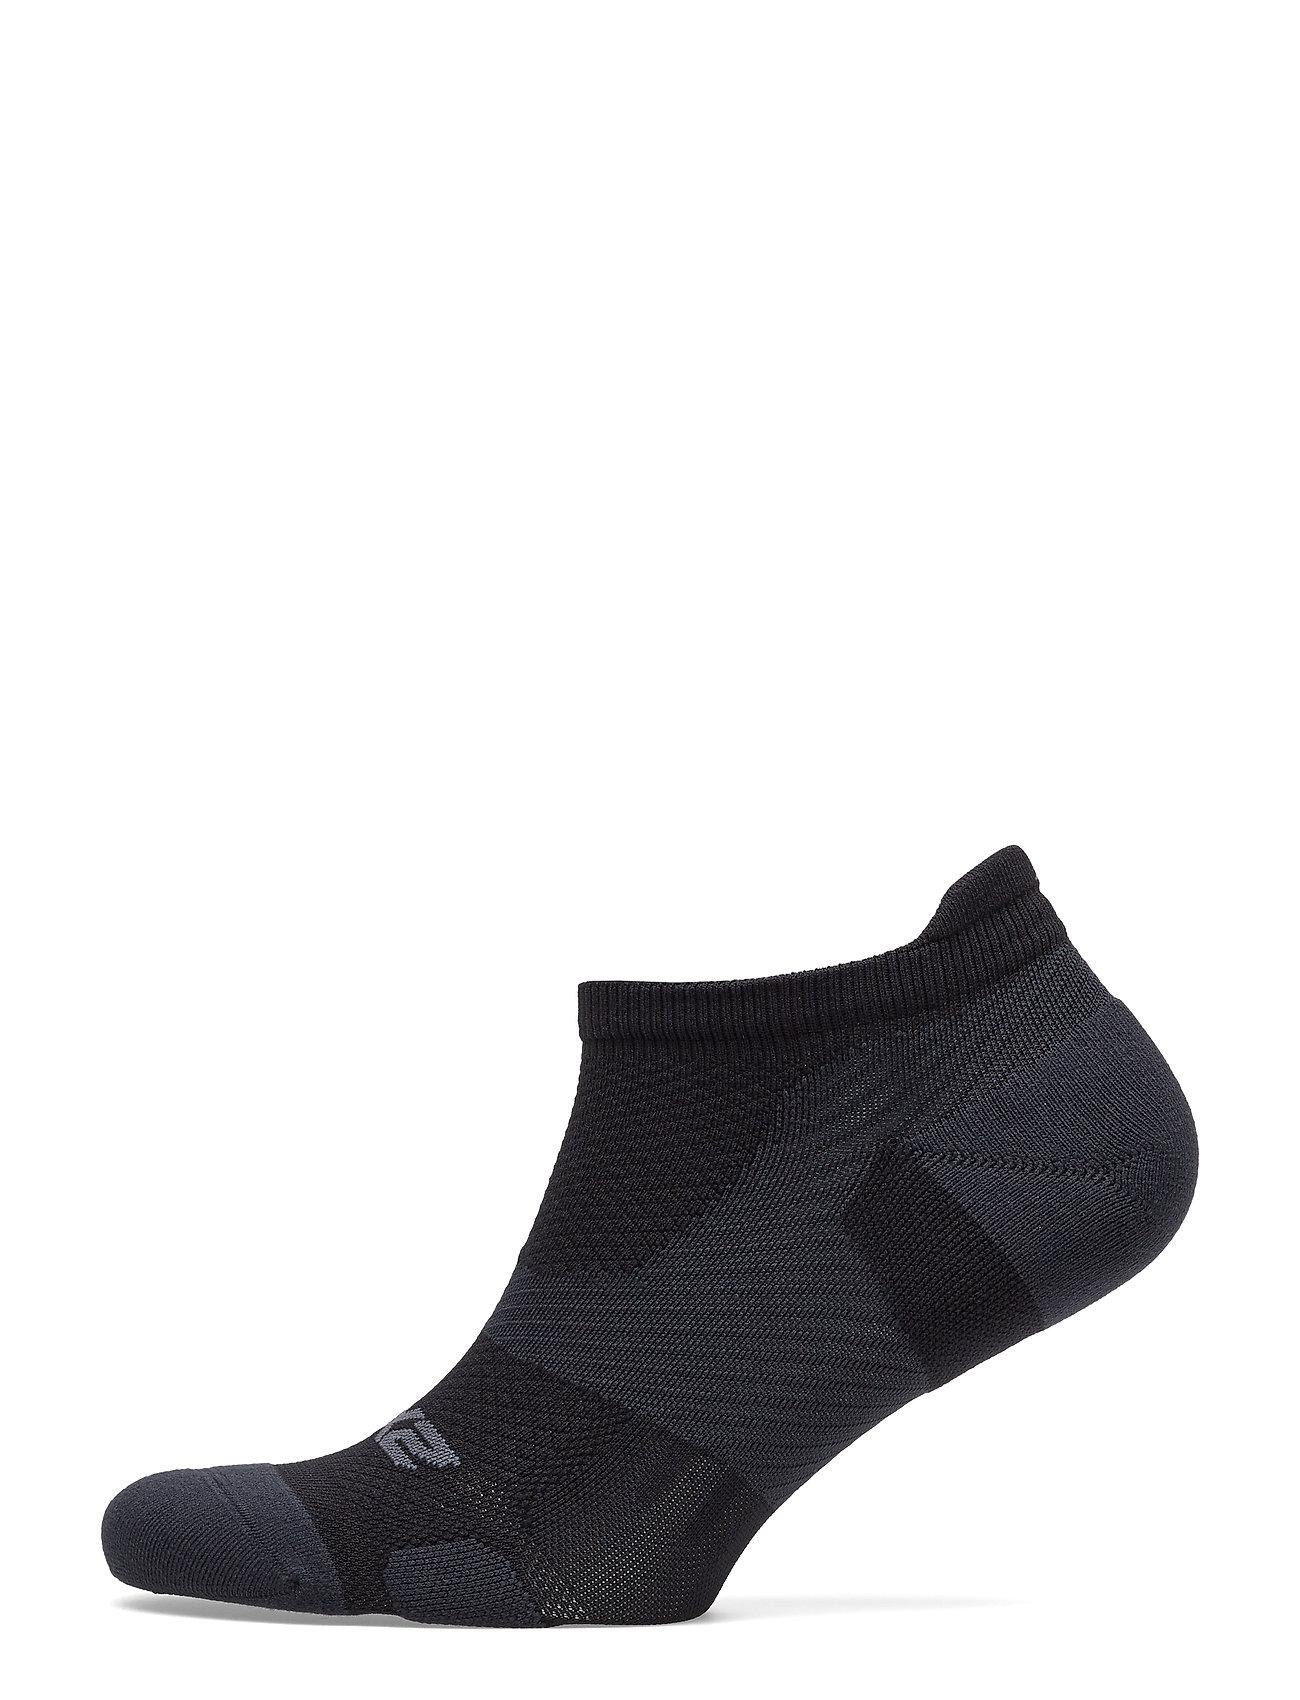 Vectr Cushion titanium2xu Show ublack No Socks Light hCxtrsQd